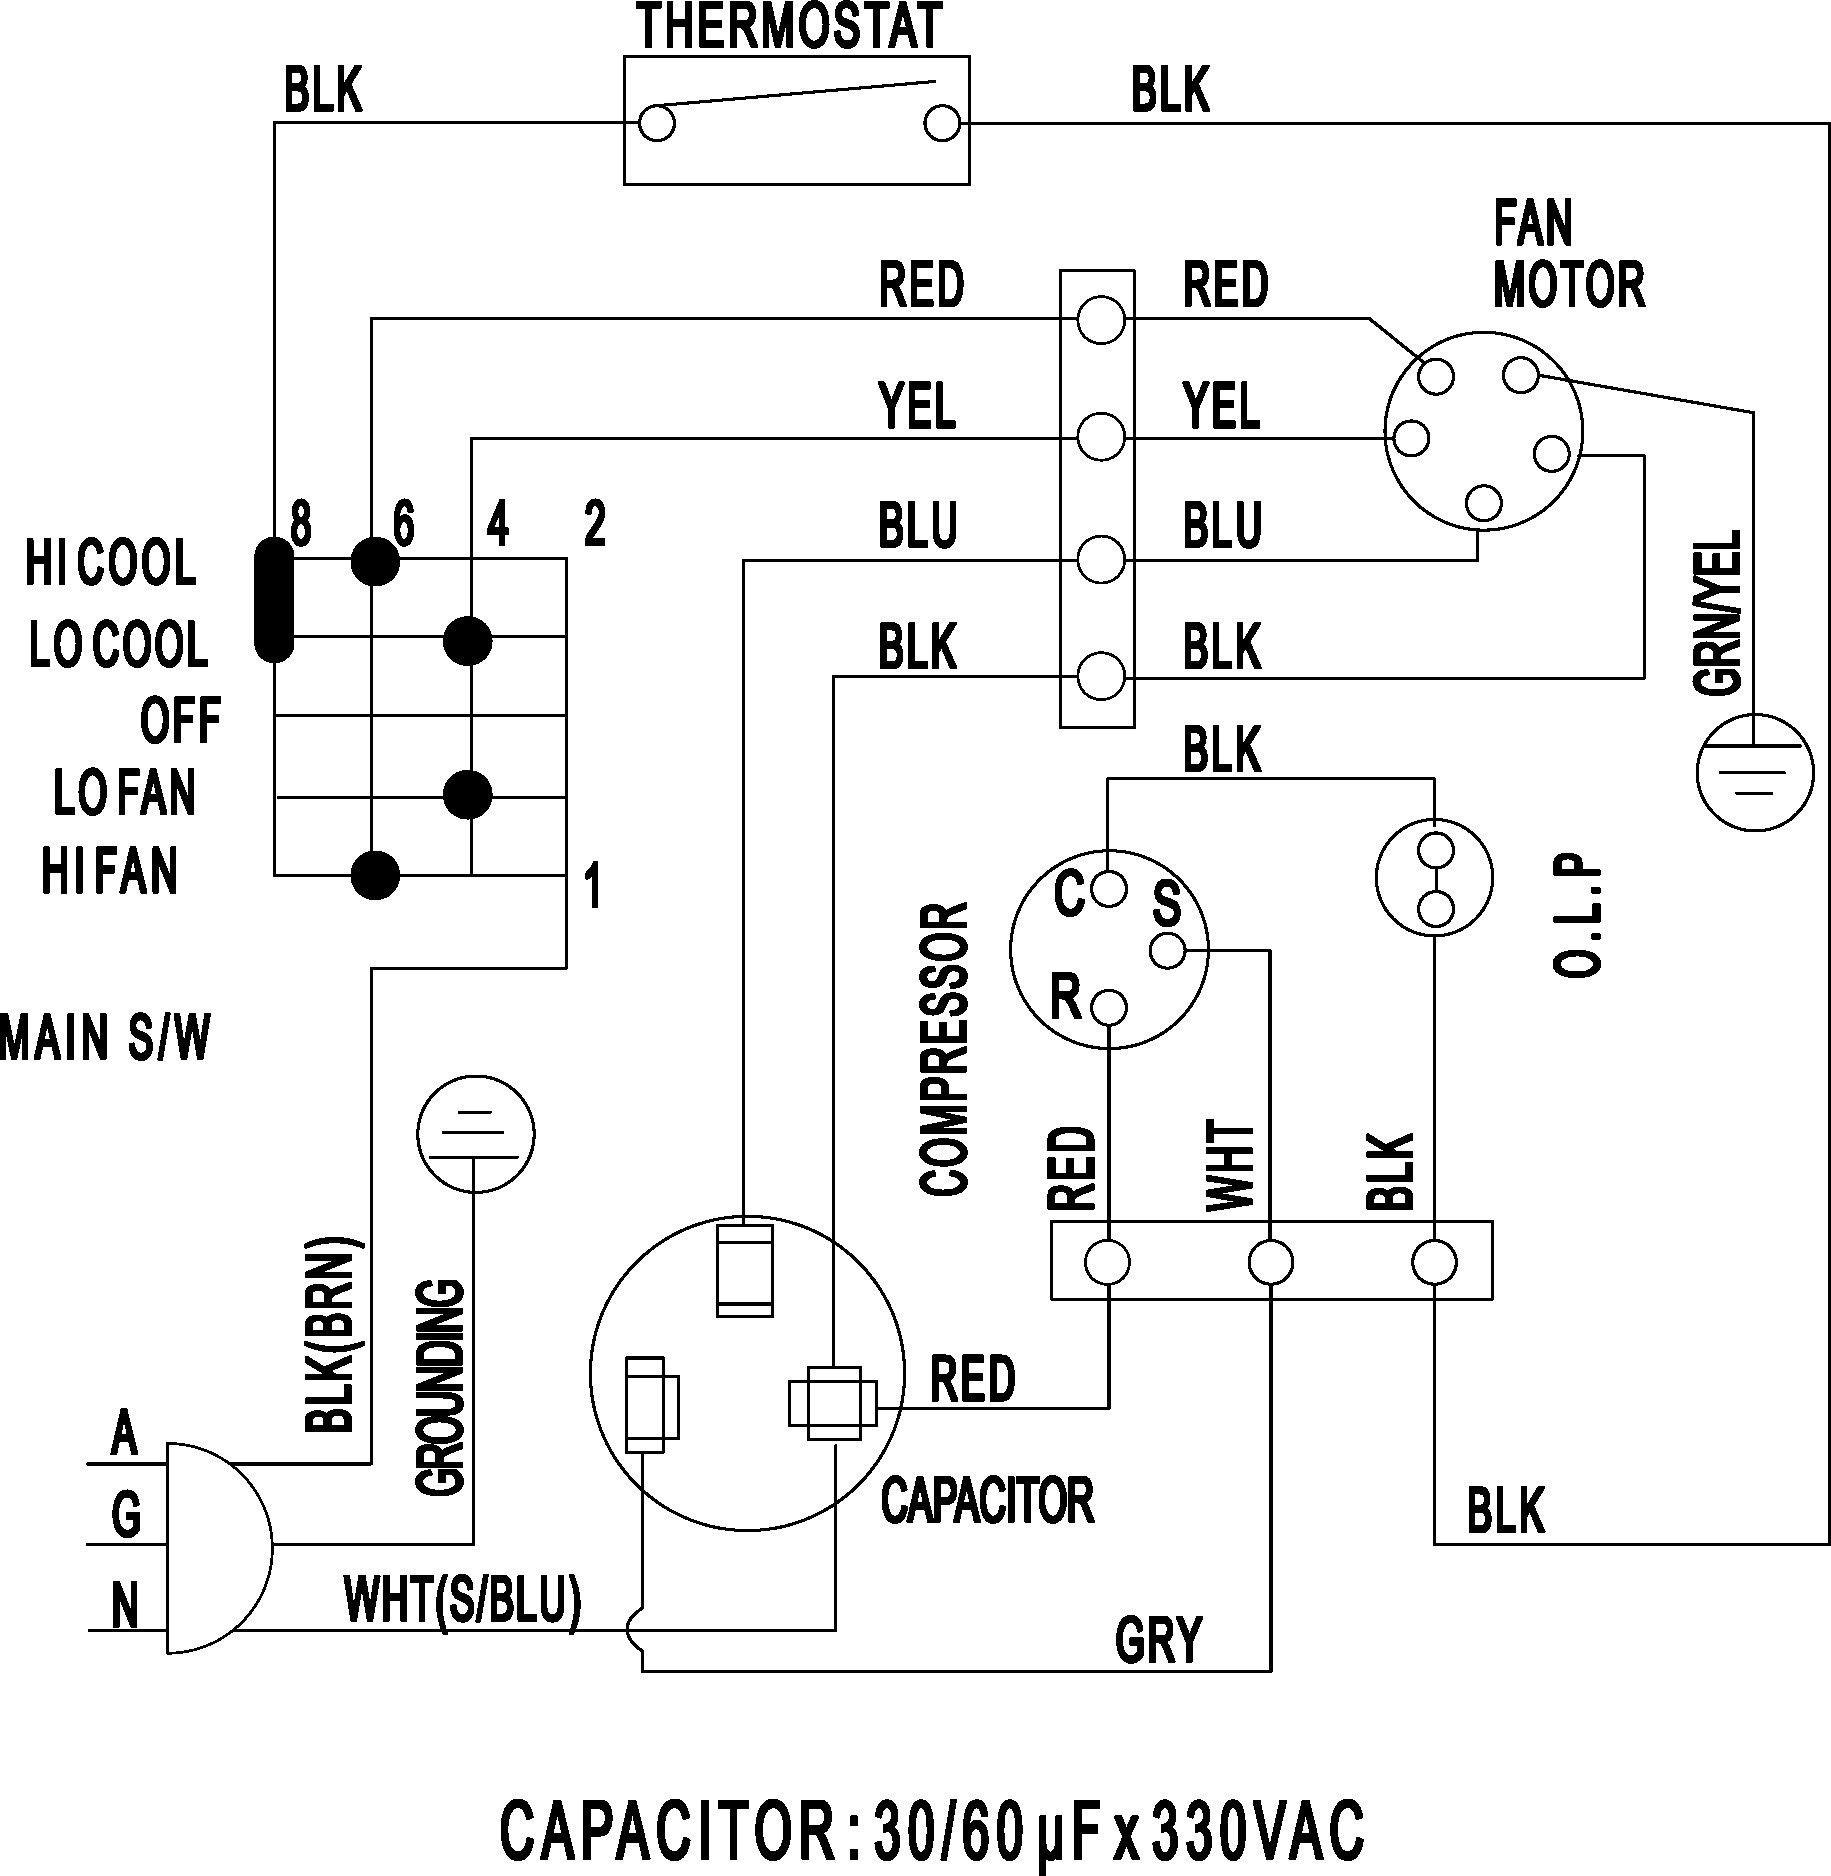 Ac Unit Wiring Schematic Elegant